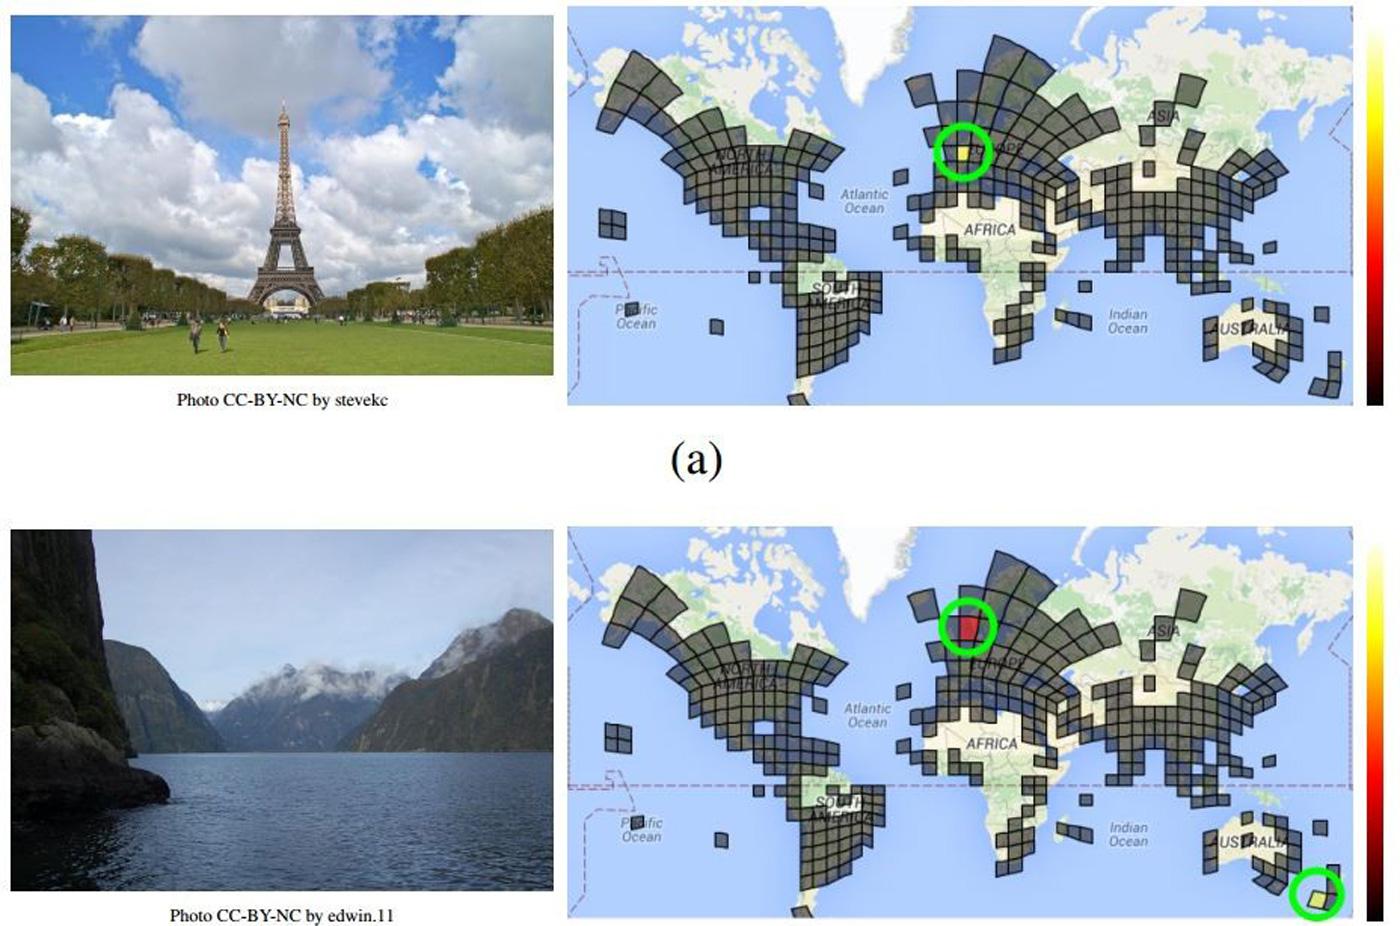 Google neural network tells you where photos were taken